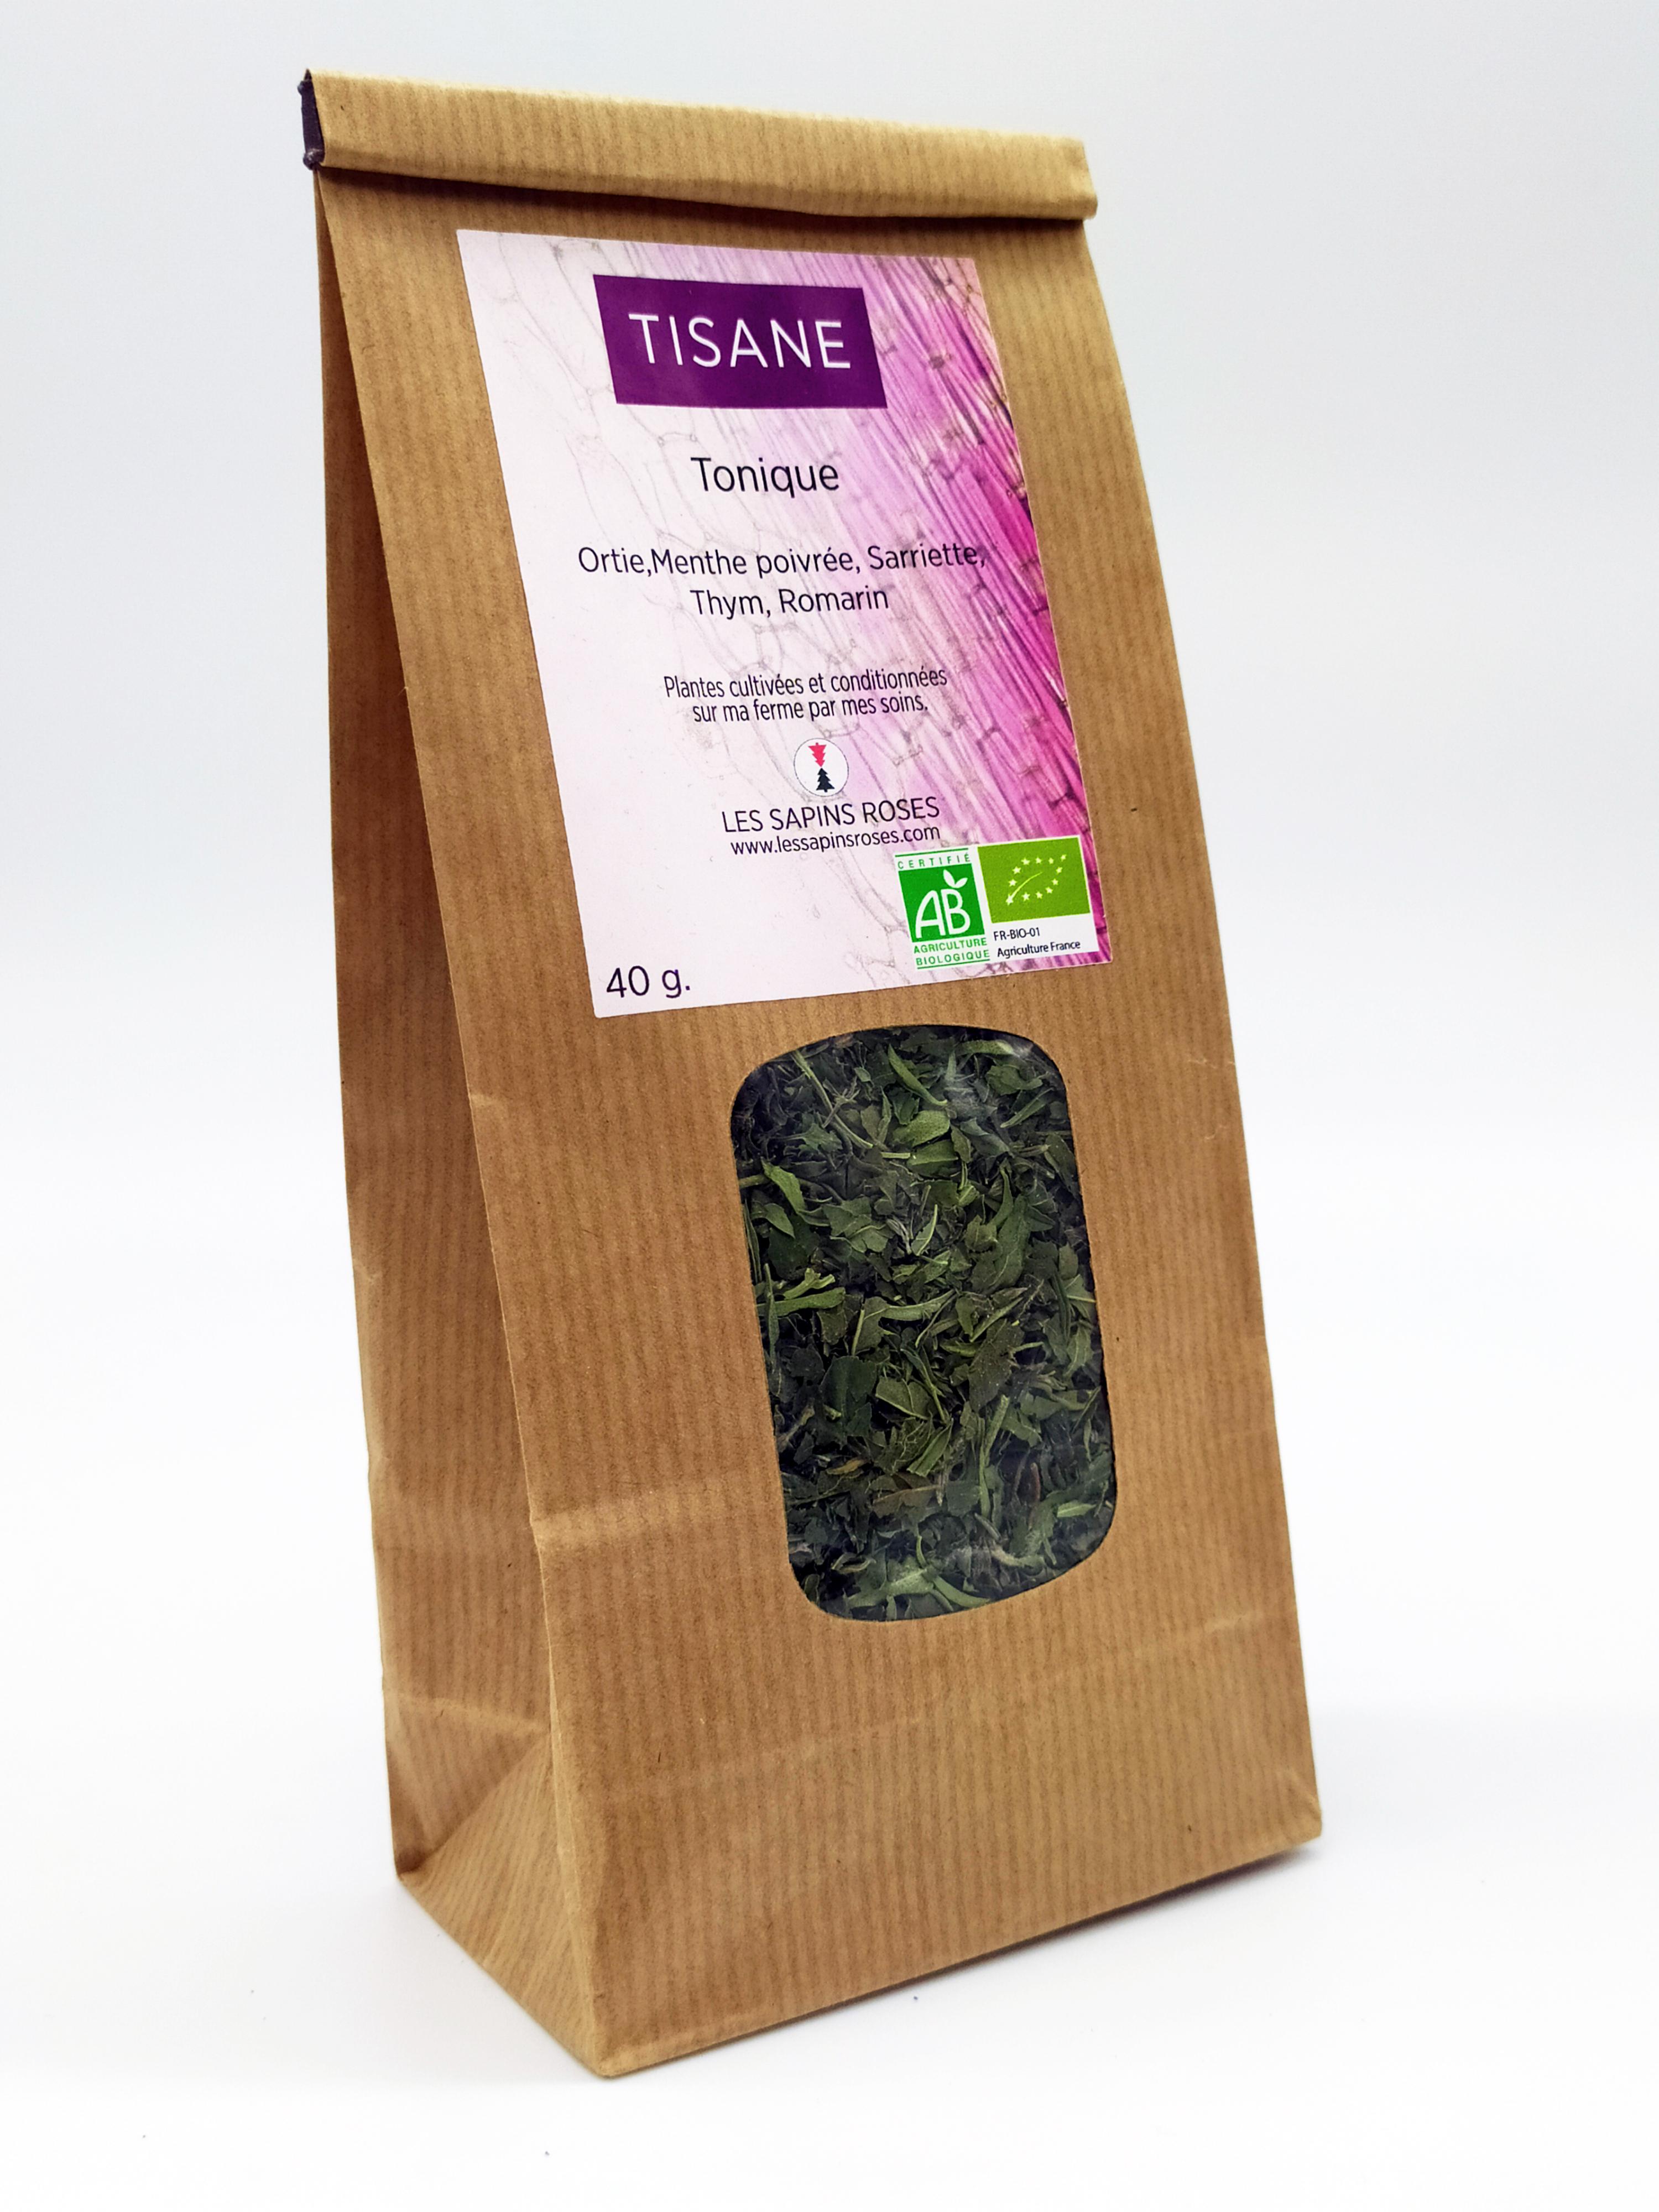 Tisane Tonique Les Sapins Roses